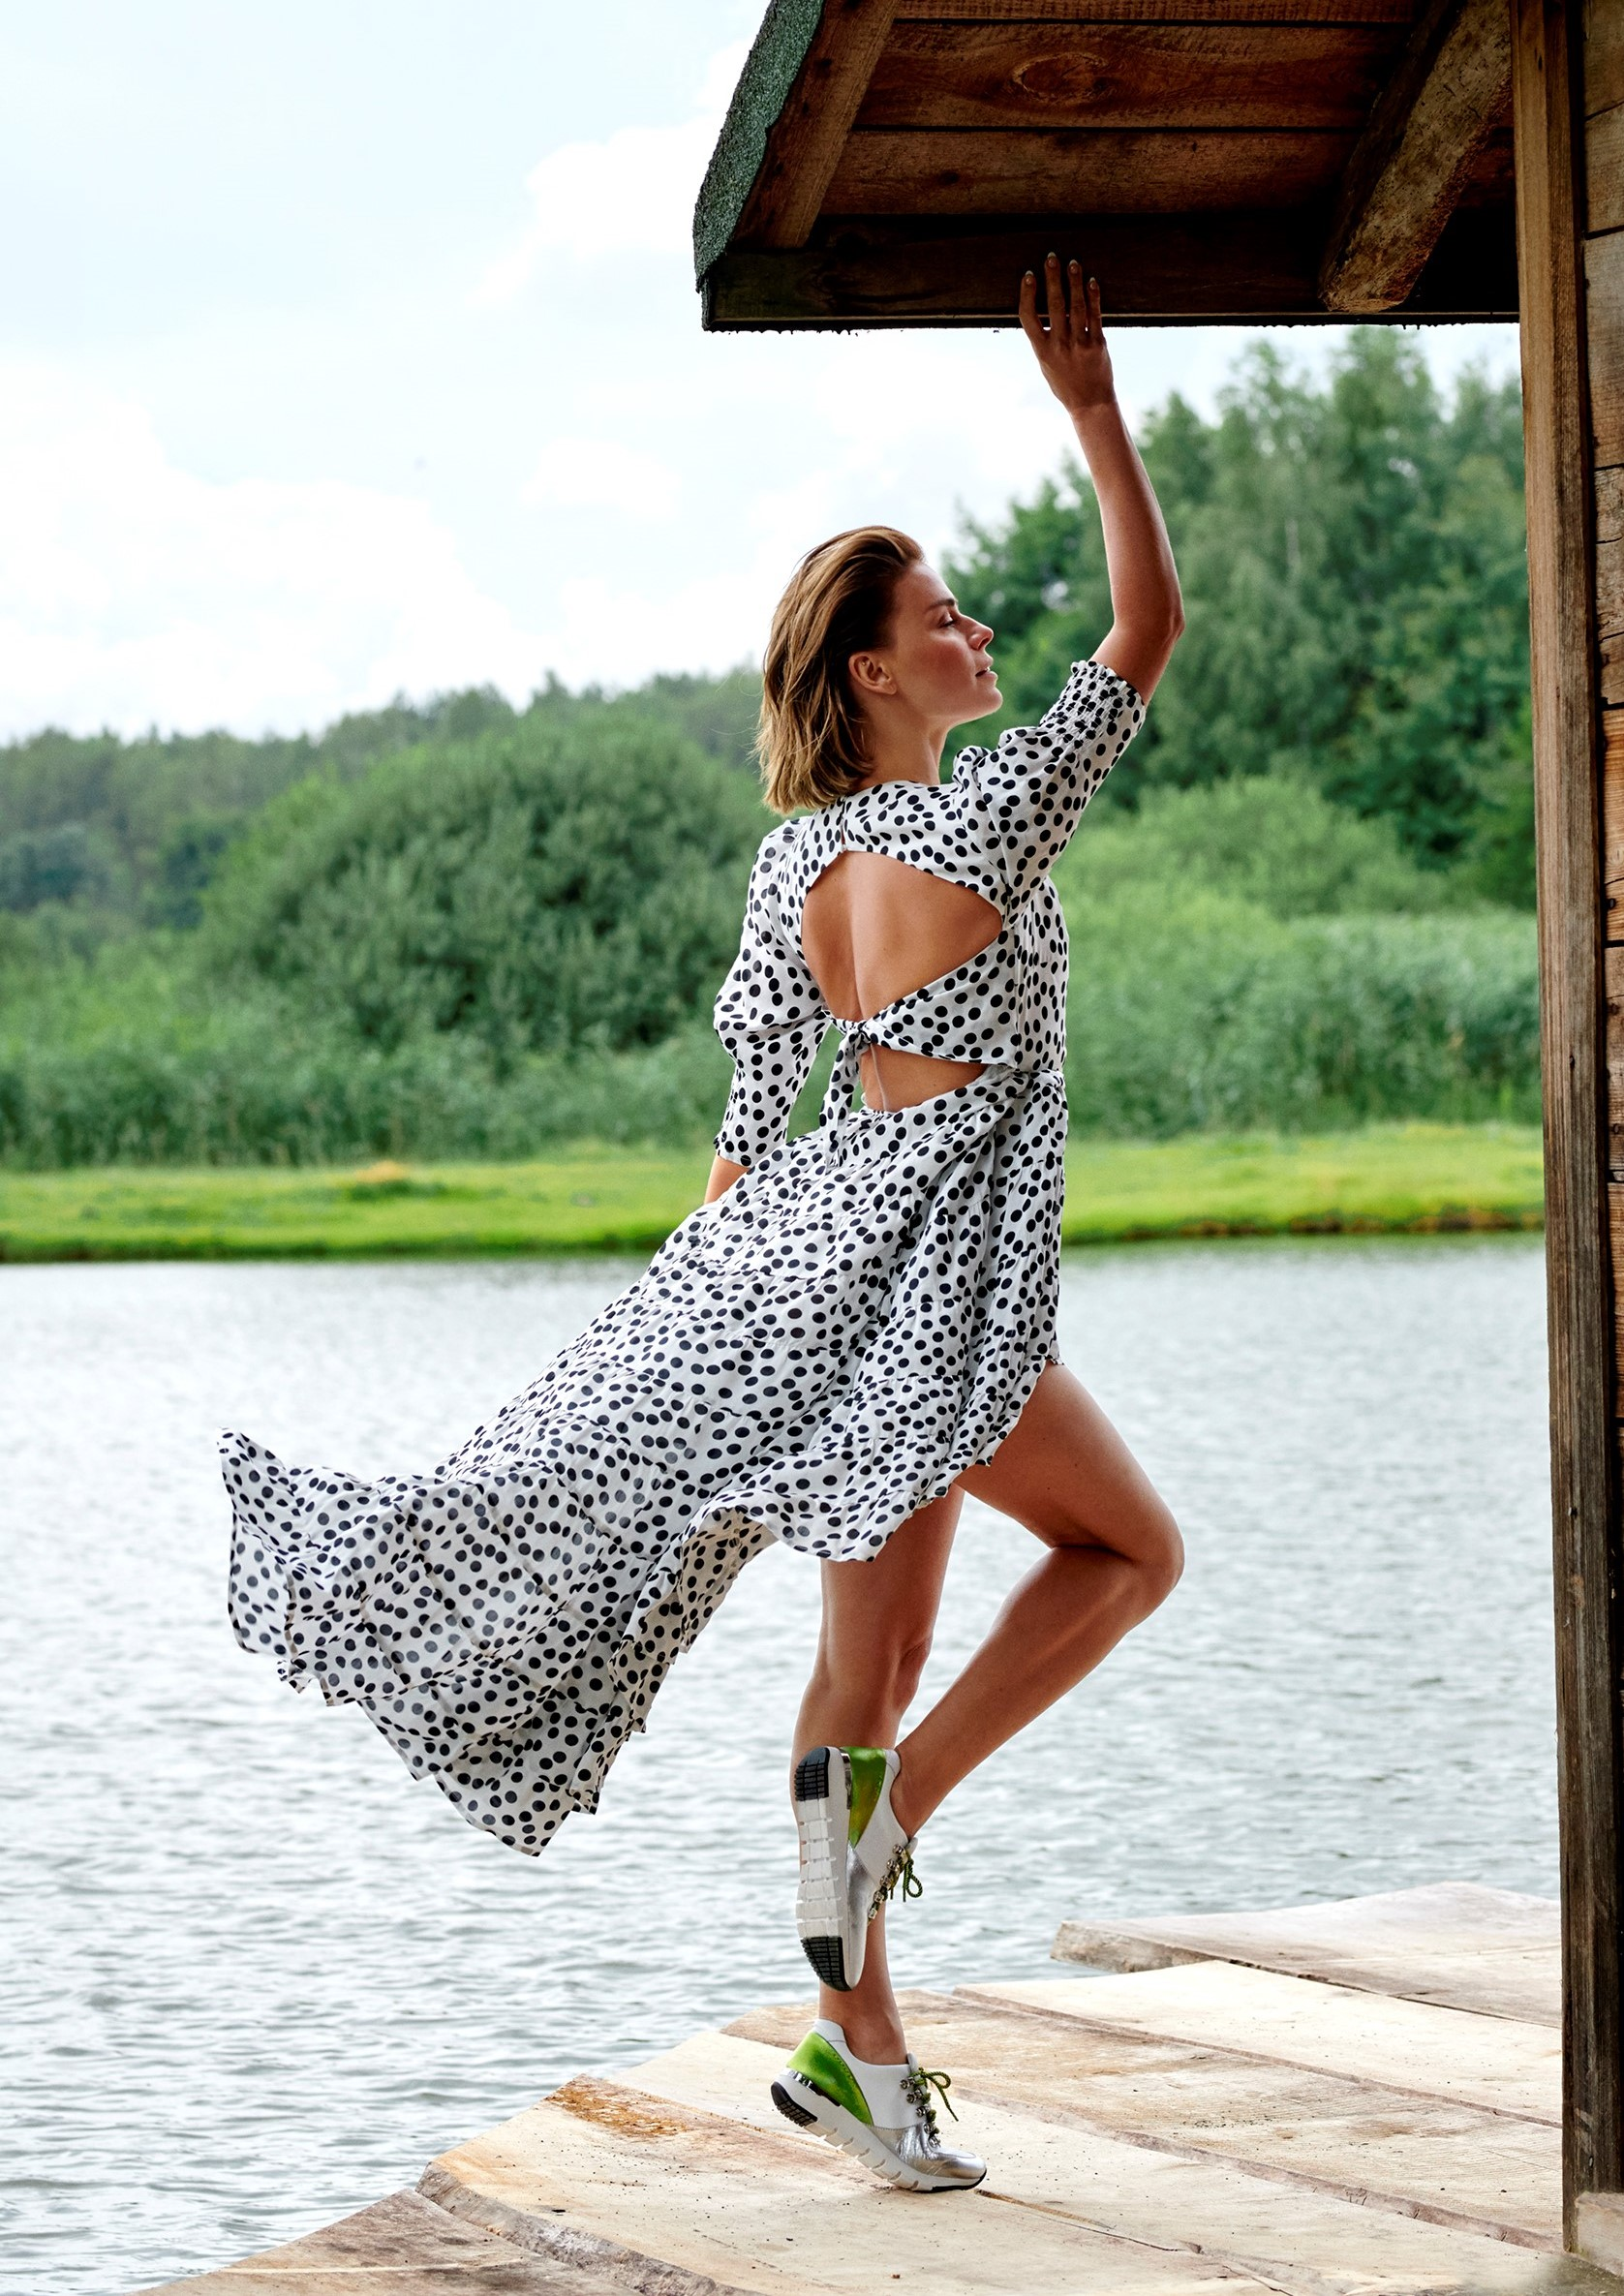 BlogStar: Natasza Urbańska w letniej sesji dla marki Caprice - BlogStar.pl